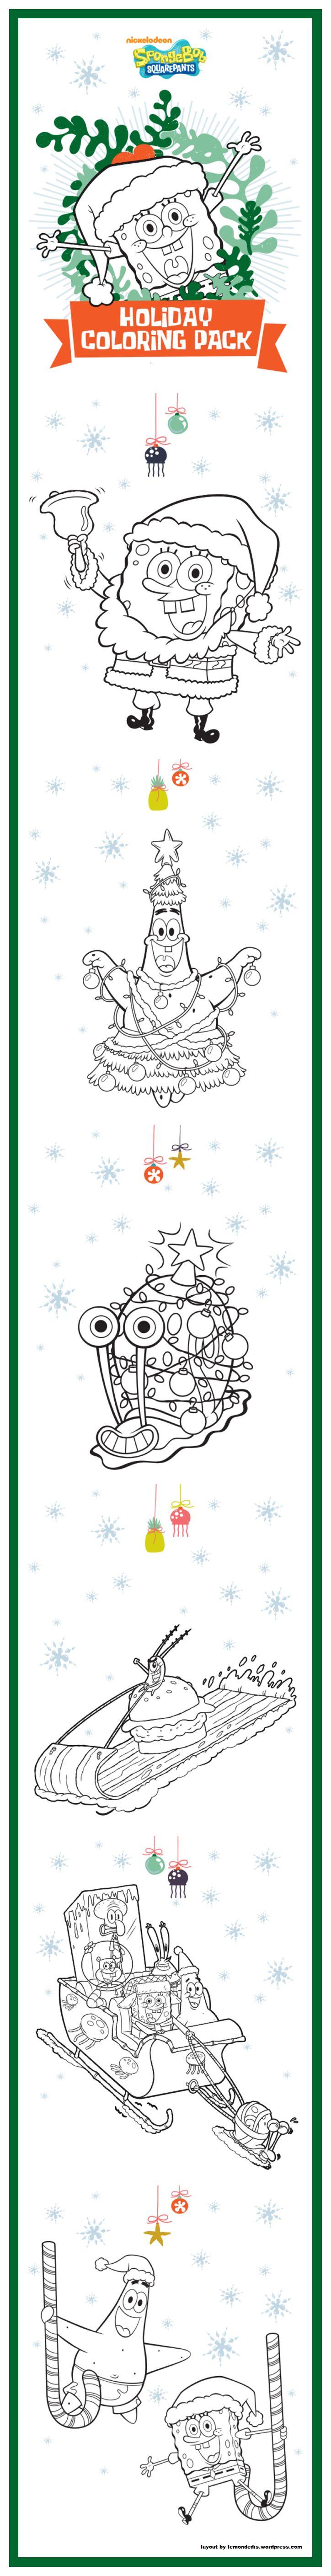 Spongebob Santapants Happy Holidays Coloring Pack